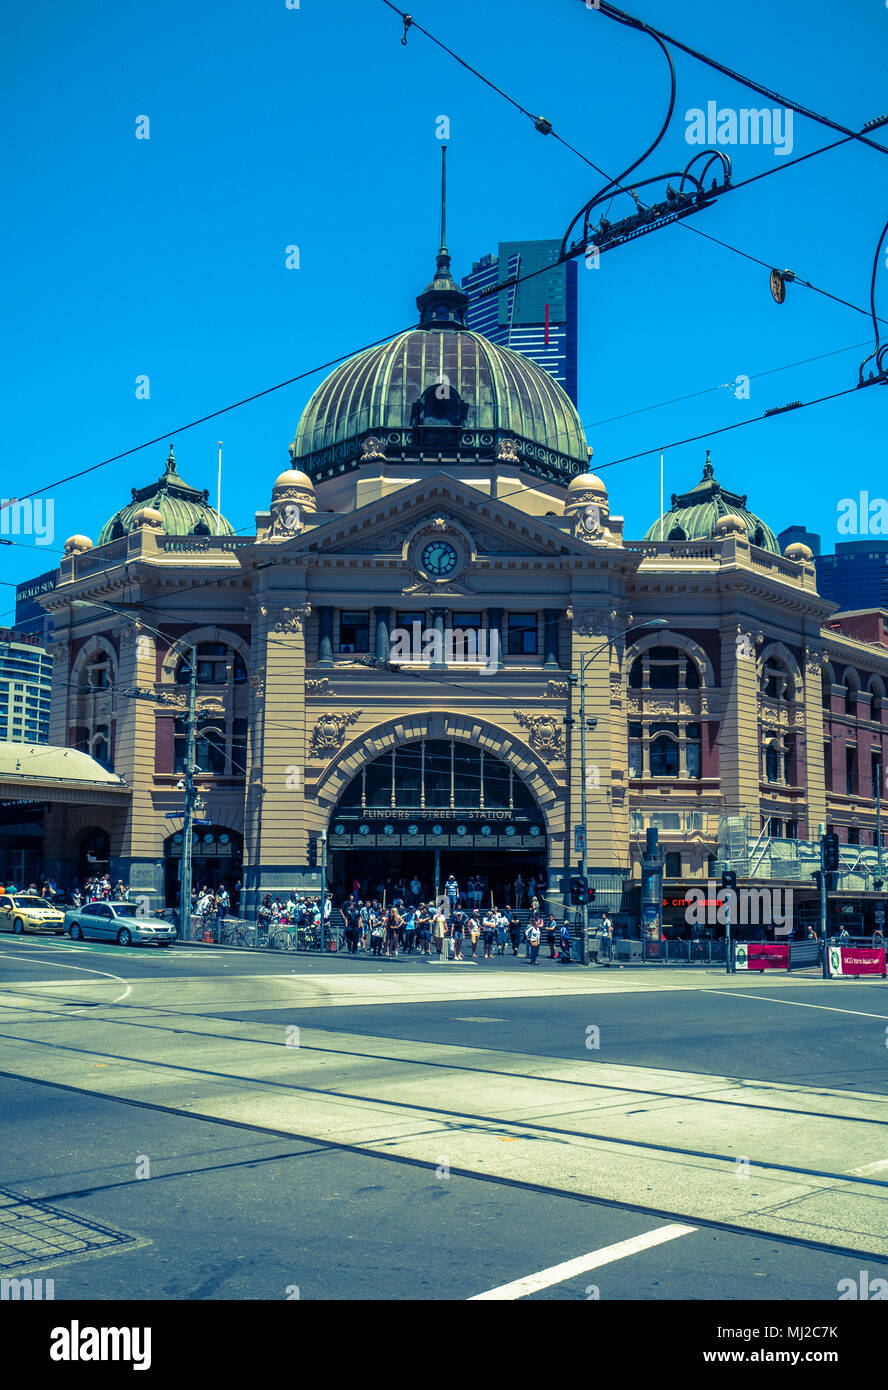 Desaturated cross processed image of entrance to Flinders Street Station at corner of Swanston St. and Flinders St., Melbourne, Australia - Stock Image